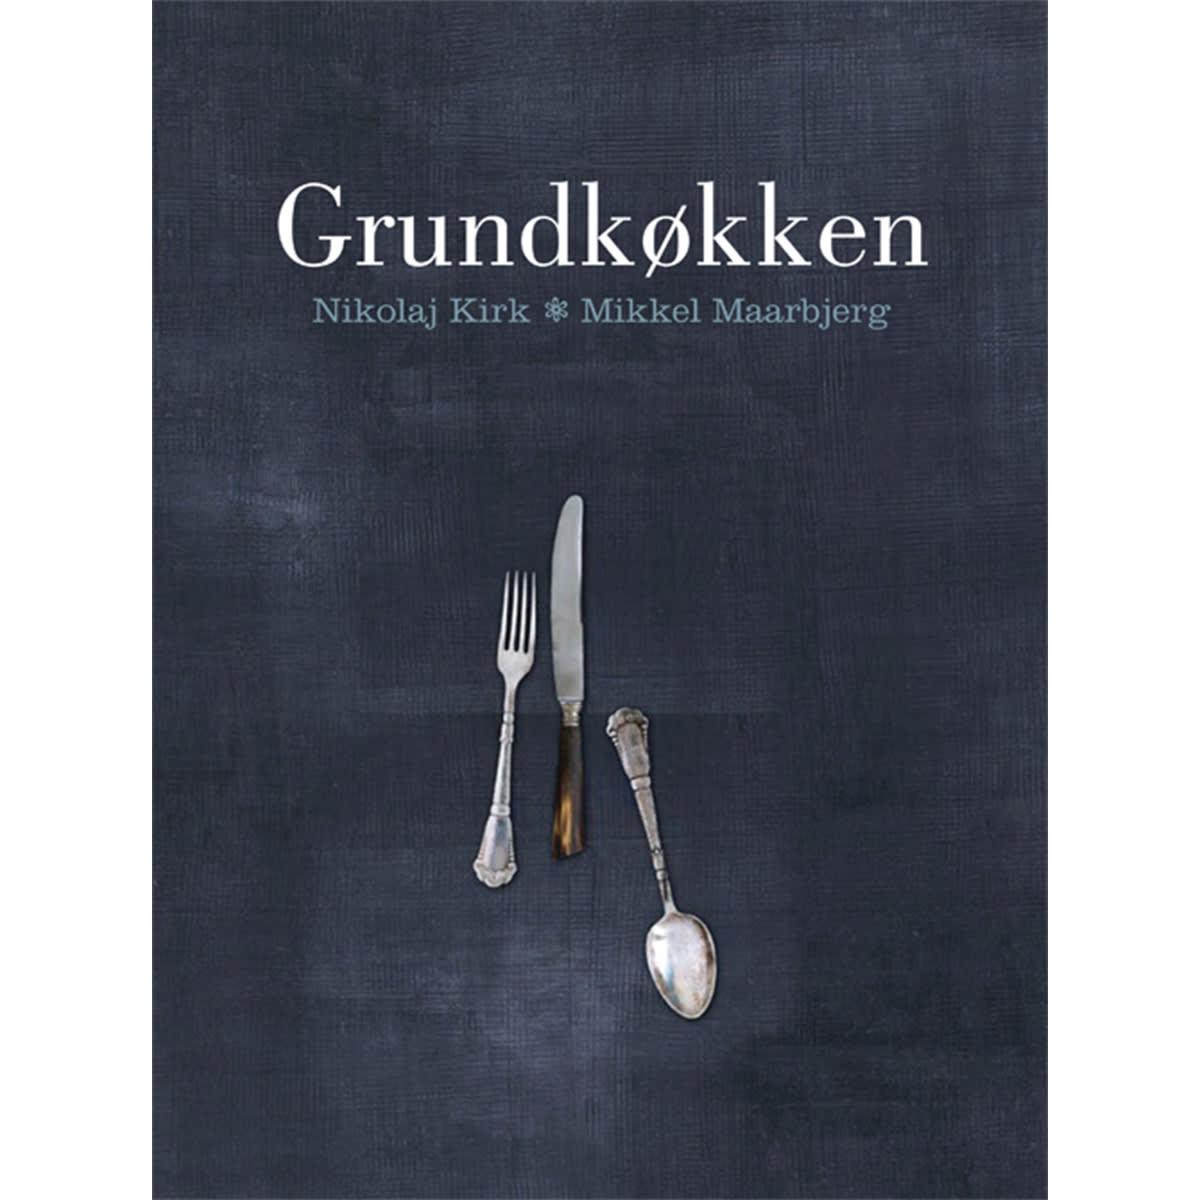 Af Nikolaj Kirk & Mikkel Maarbjerg